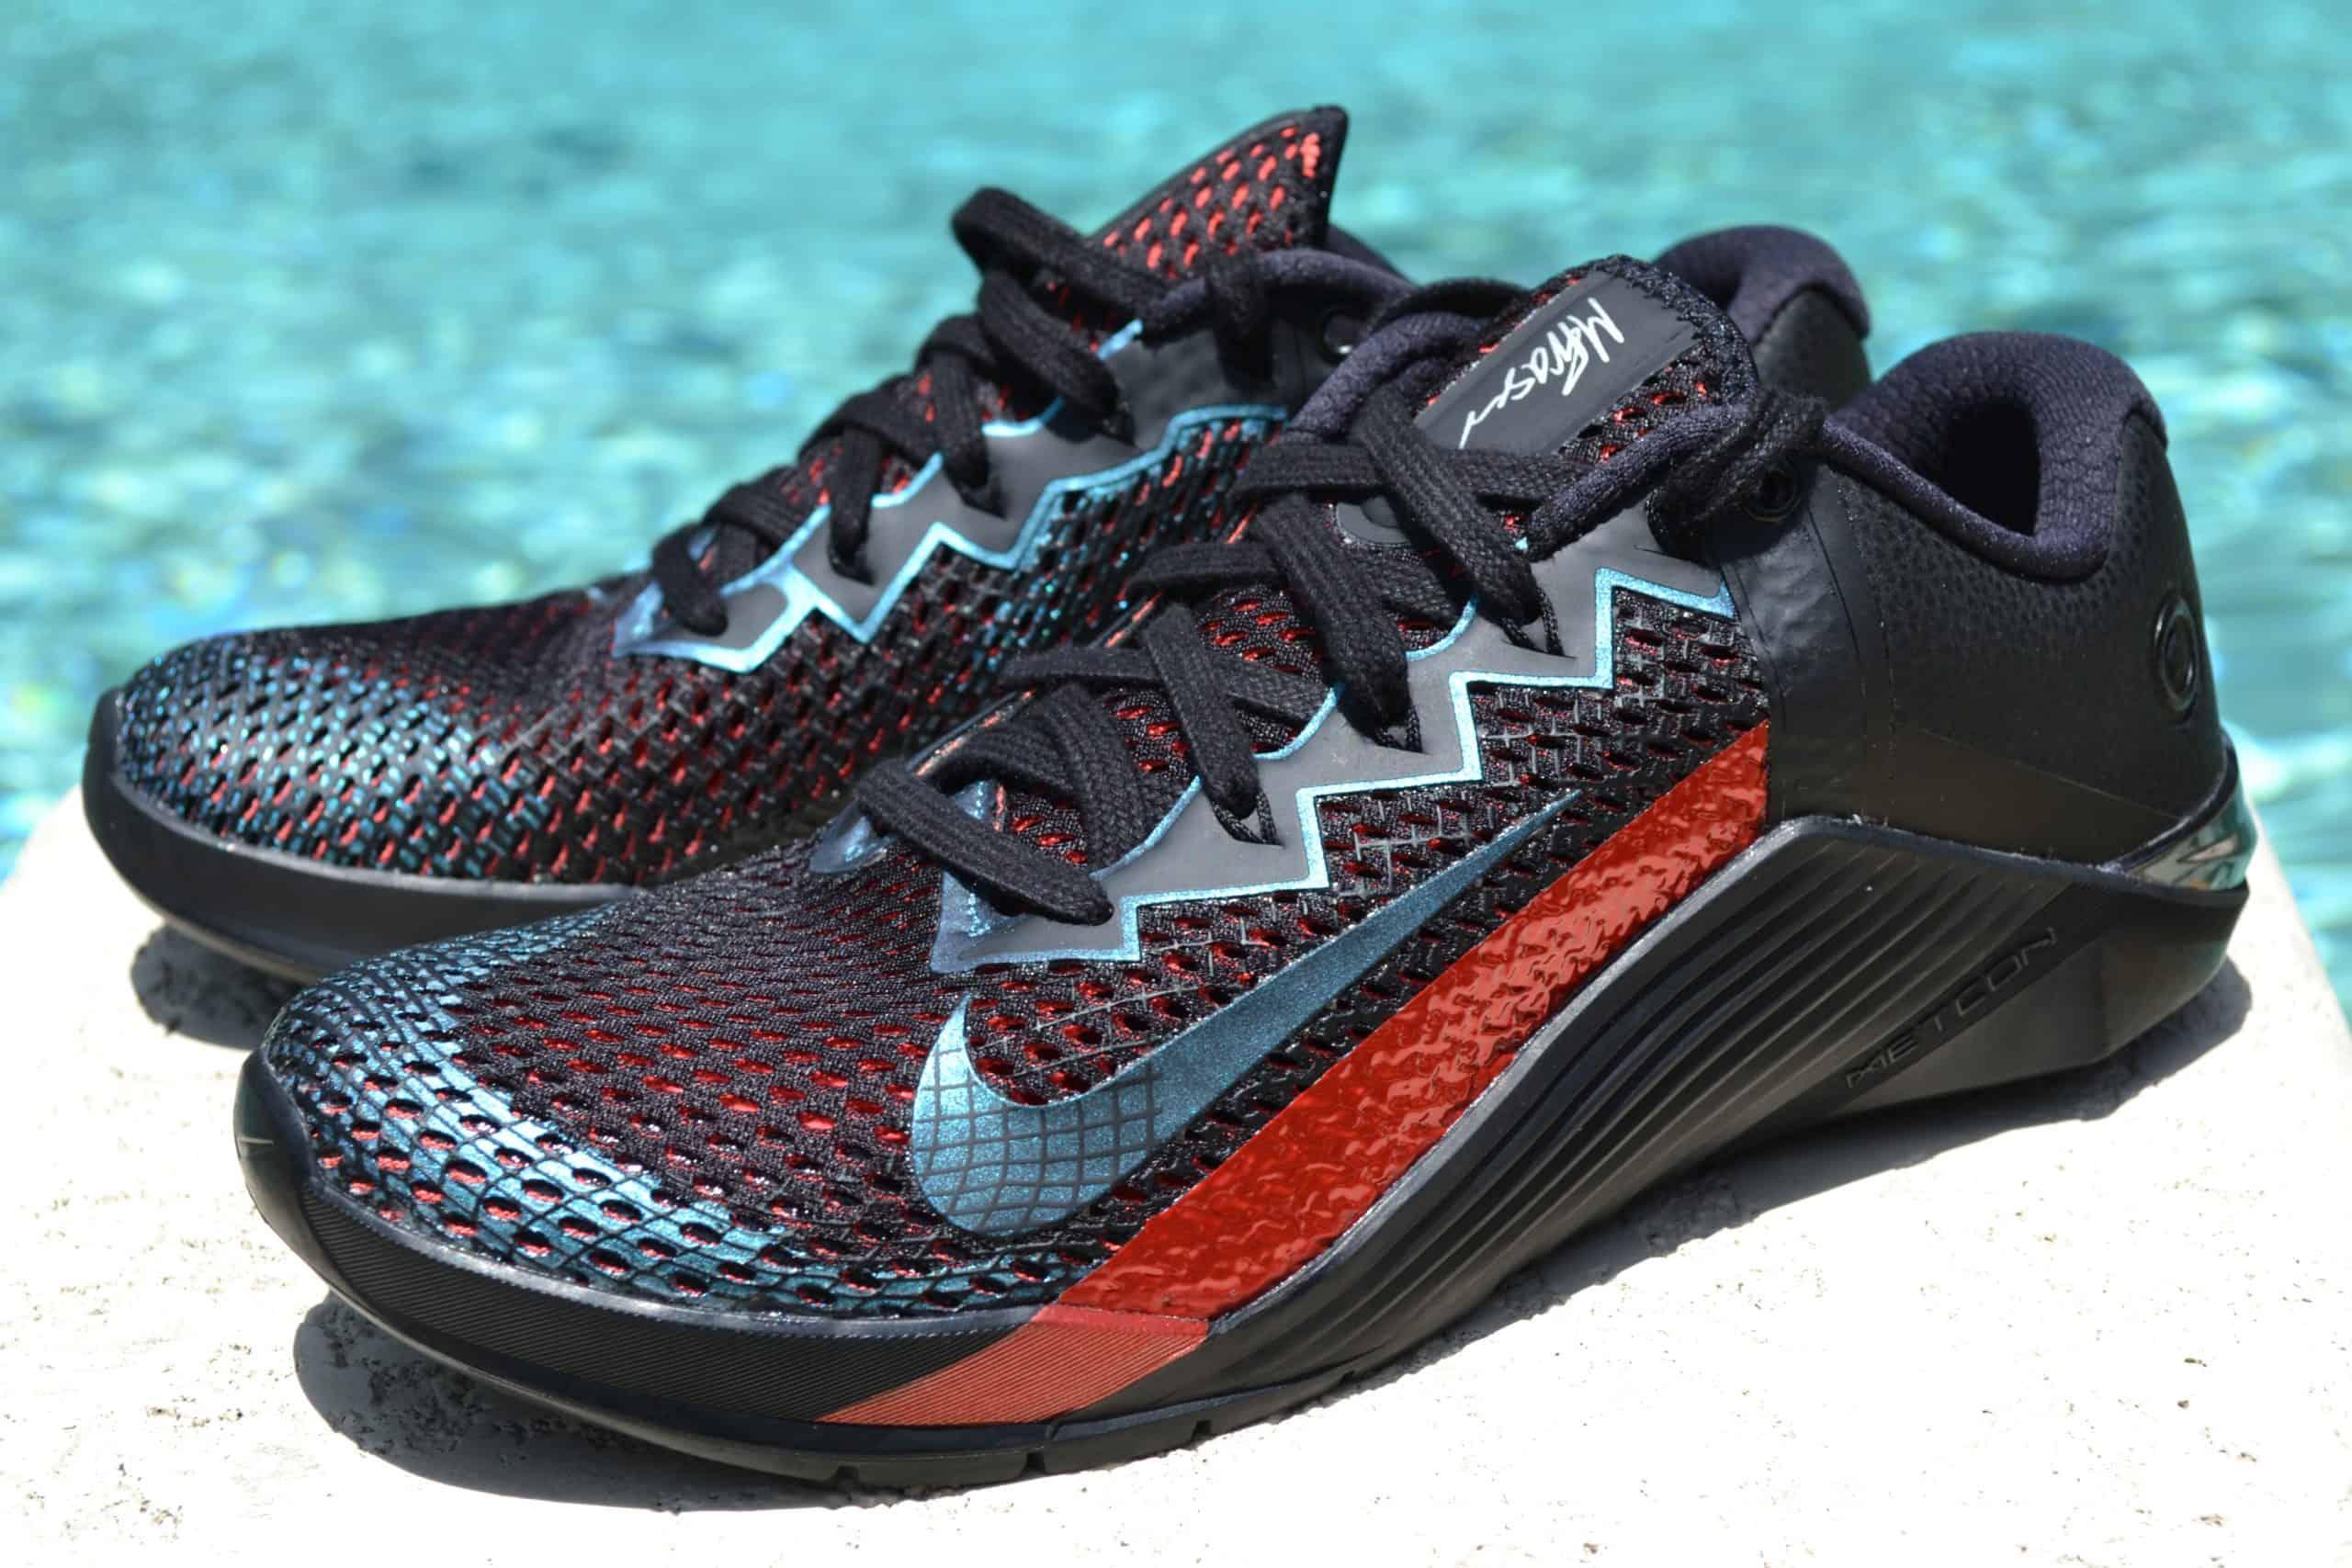 Nike Metcon 6 Mat Fraser Shoe Review